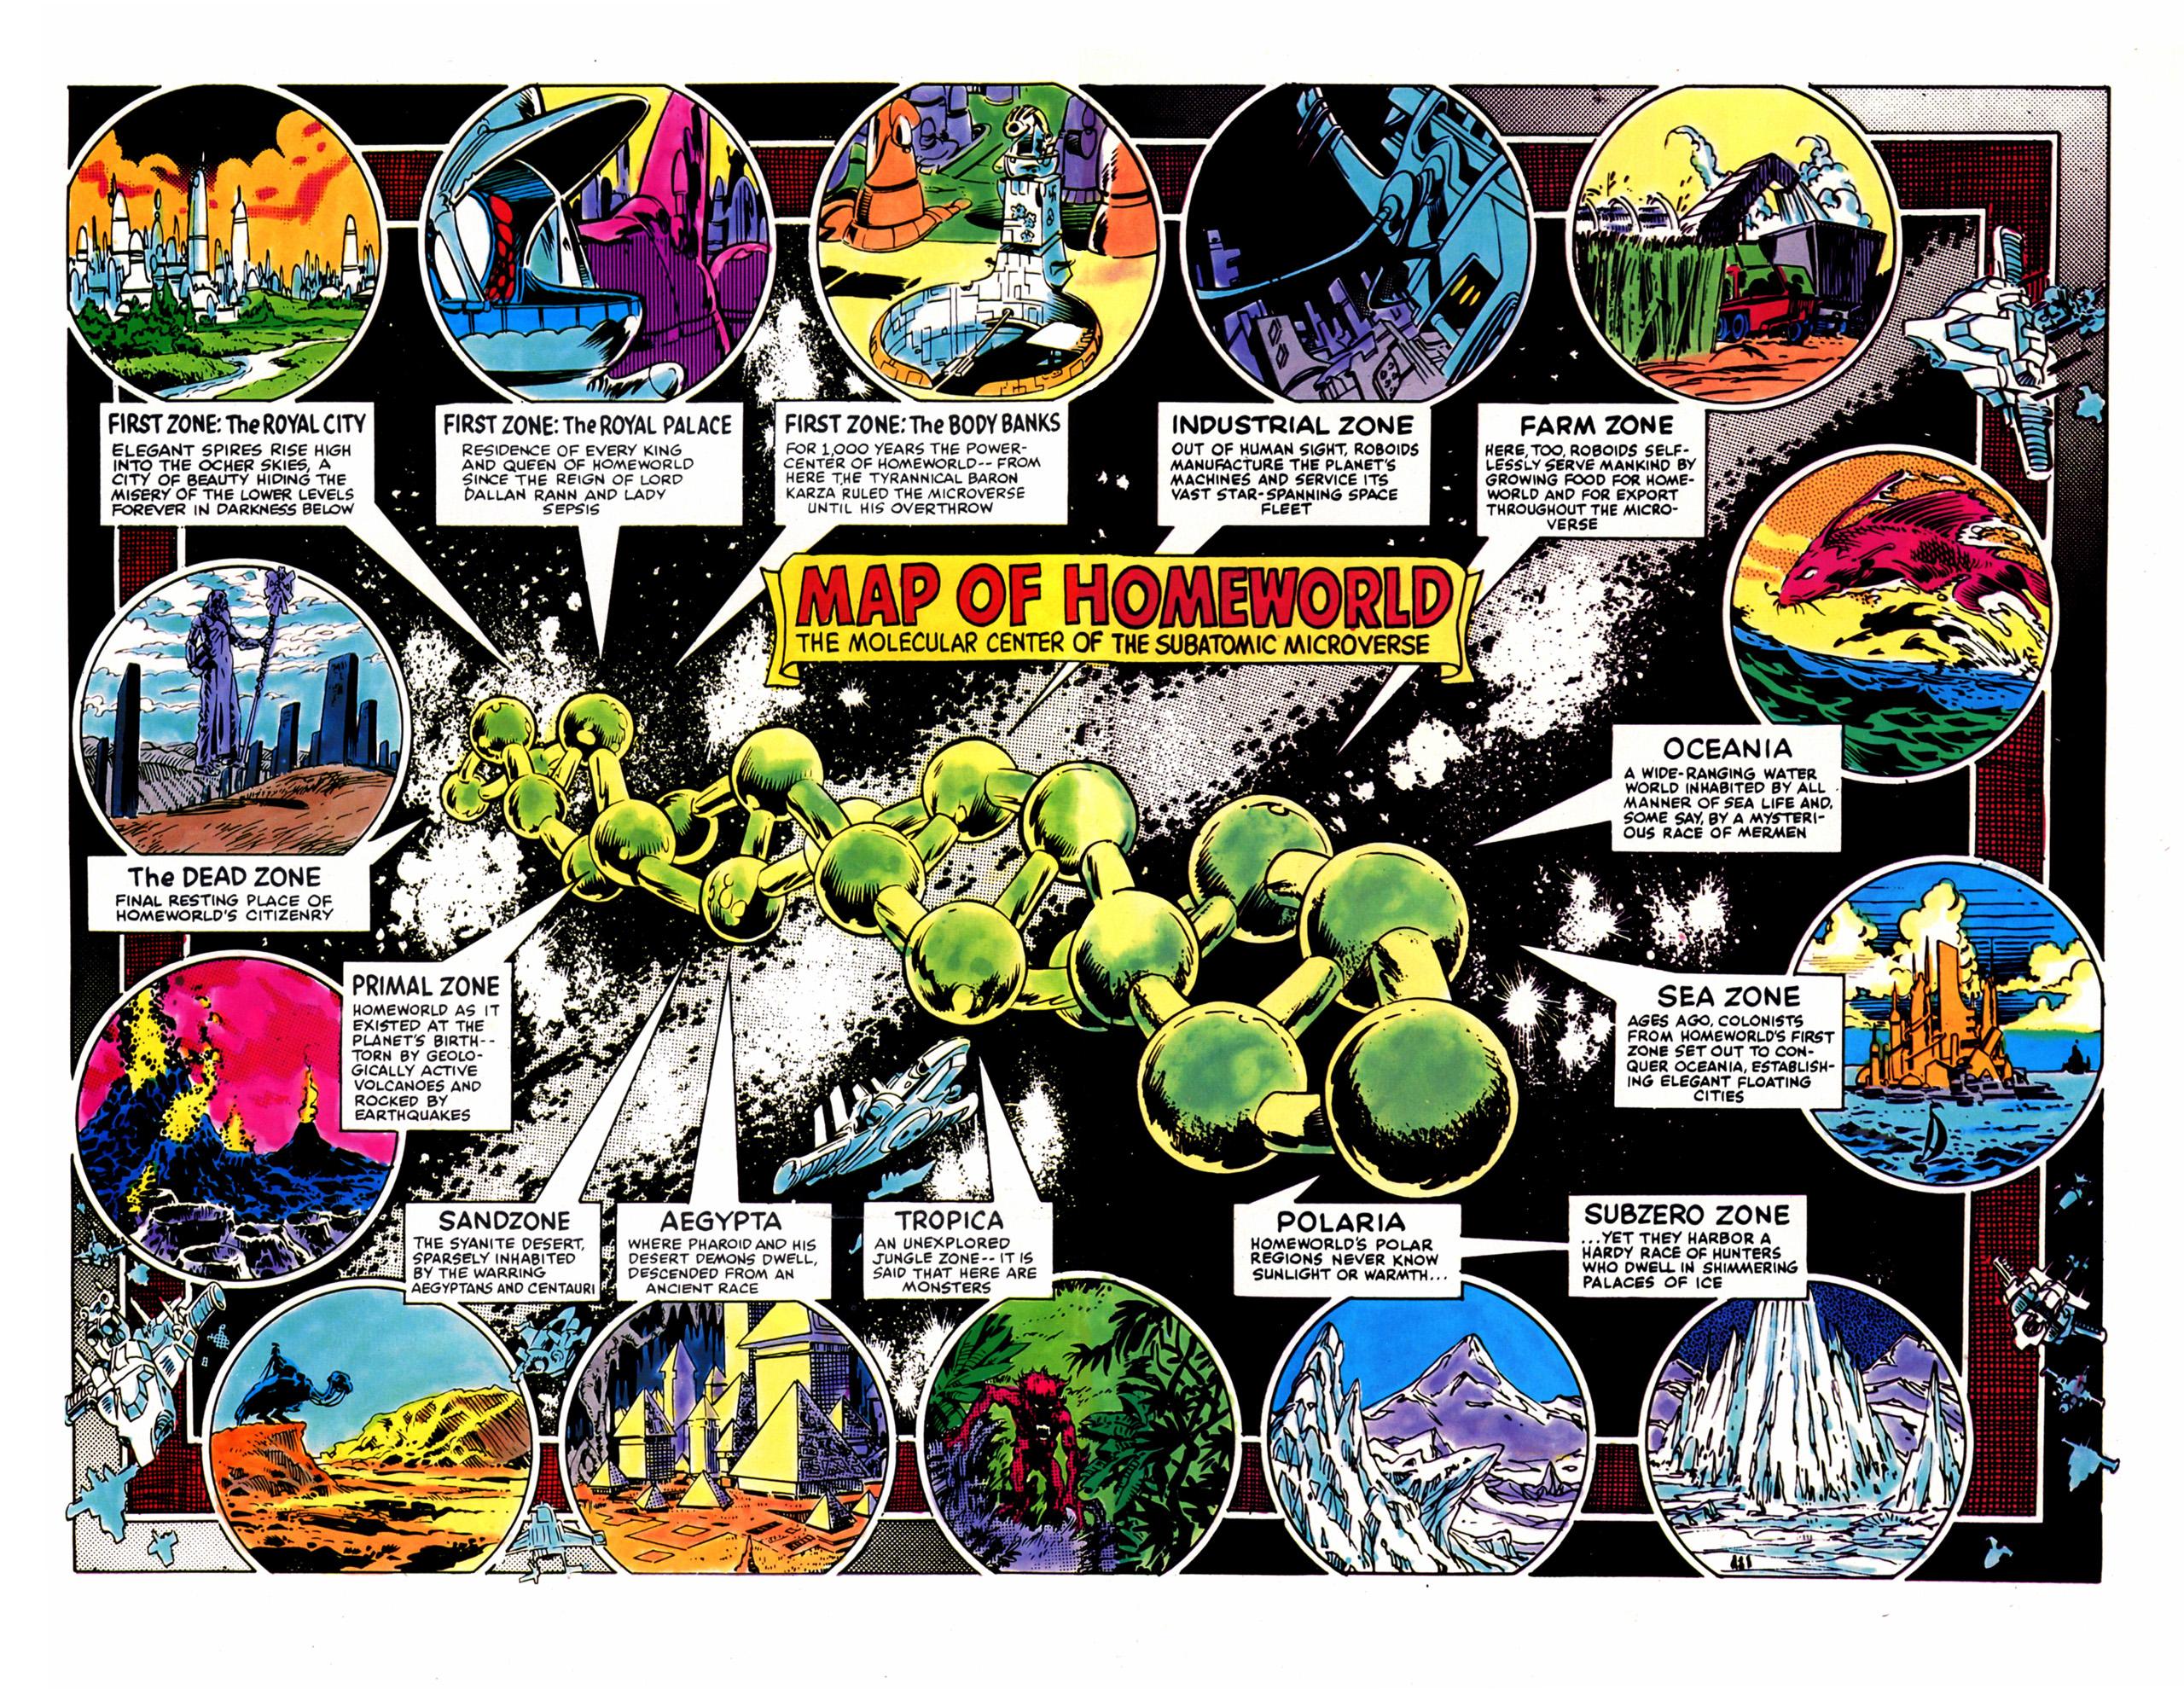 Homeworld (Microverse)